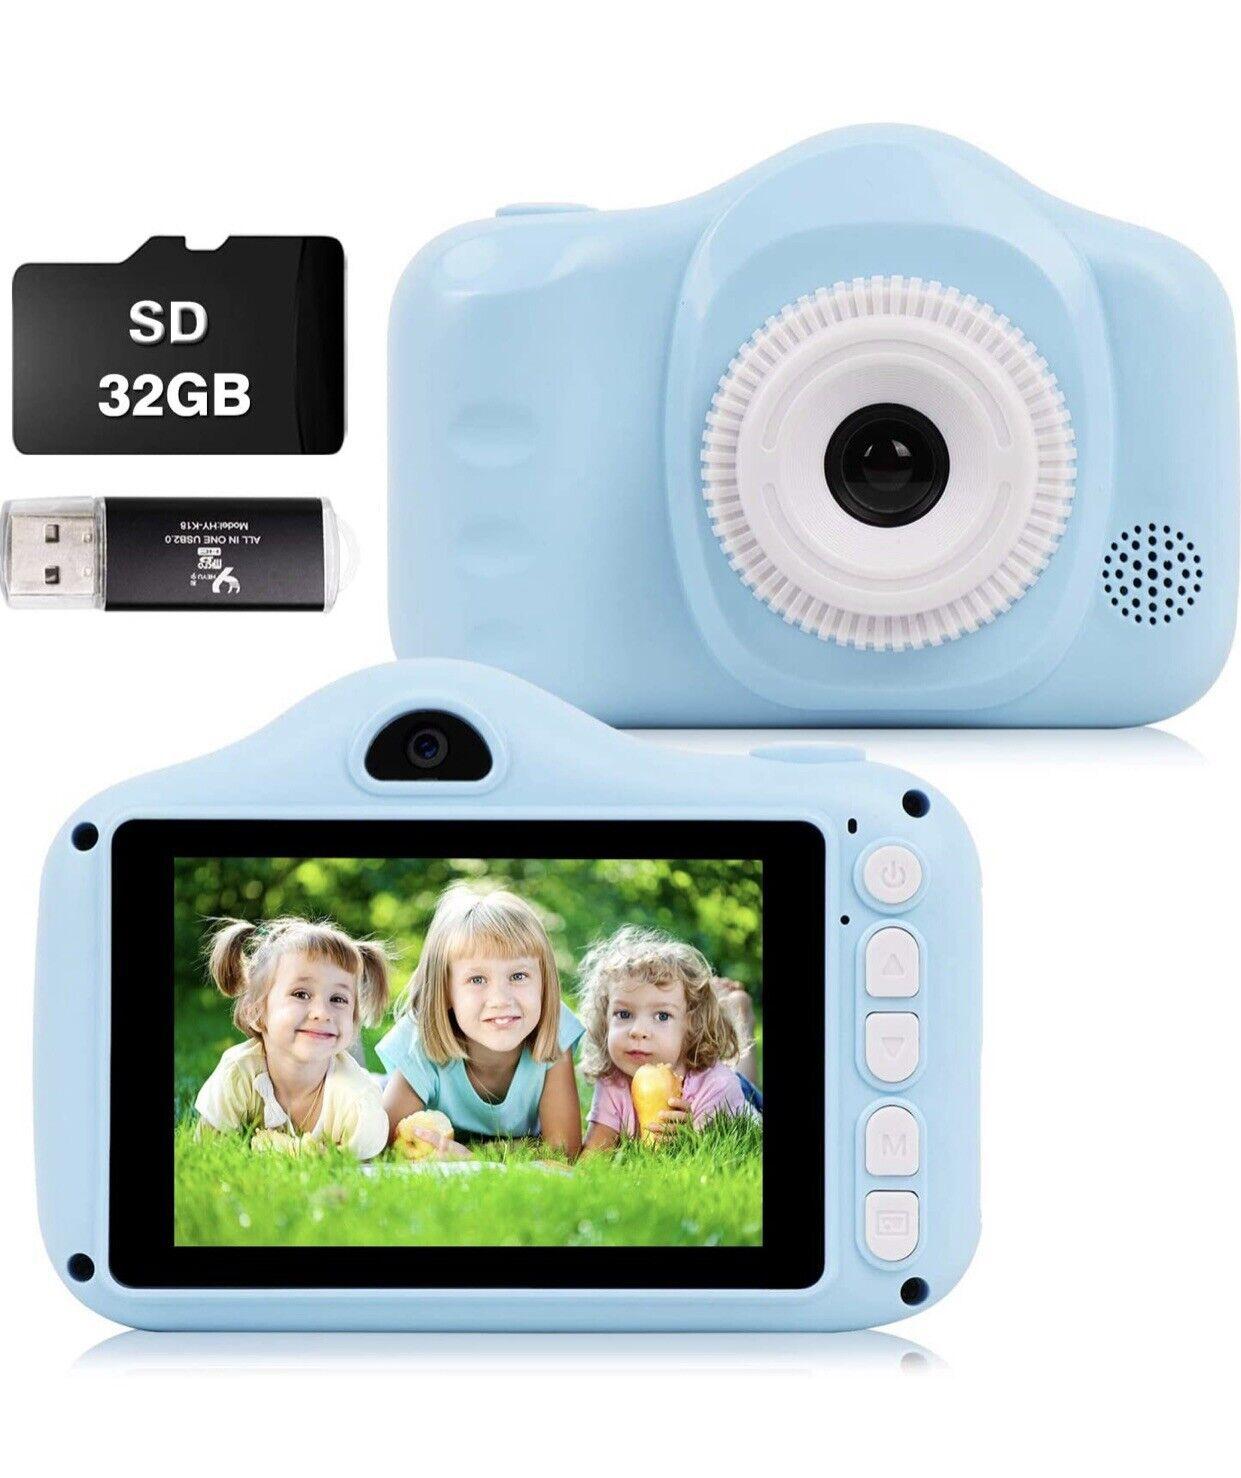 weefun Kids Camera Toys Dual Lens Digital Selfie Camera,3.5 inch Color Screen